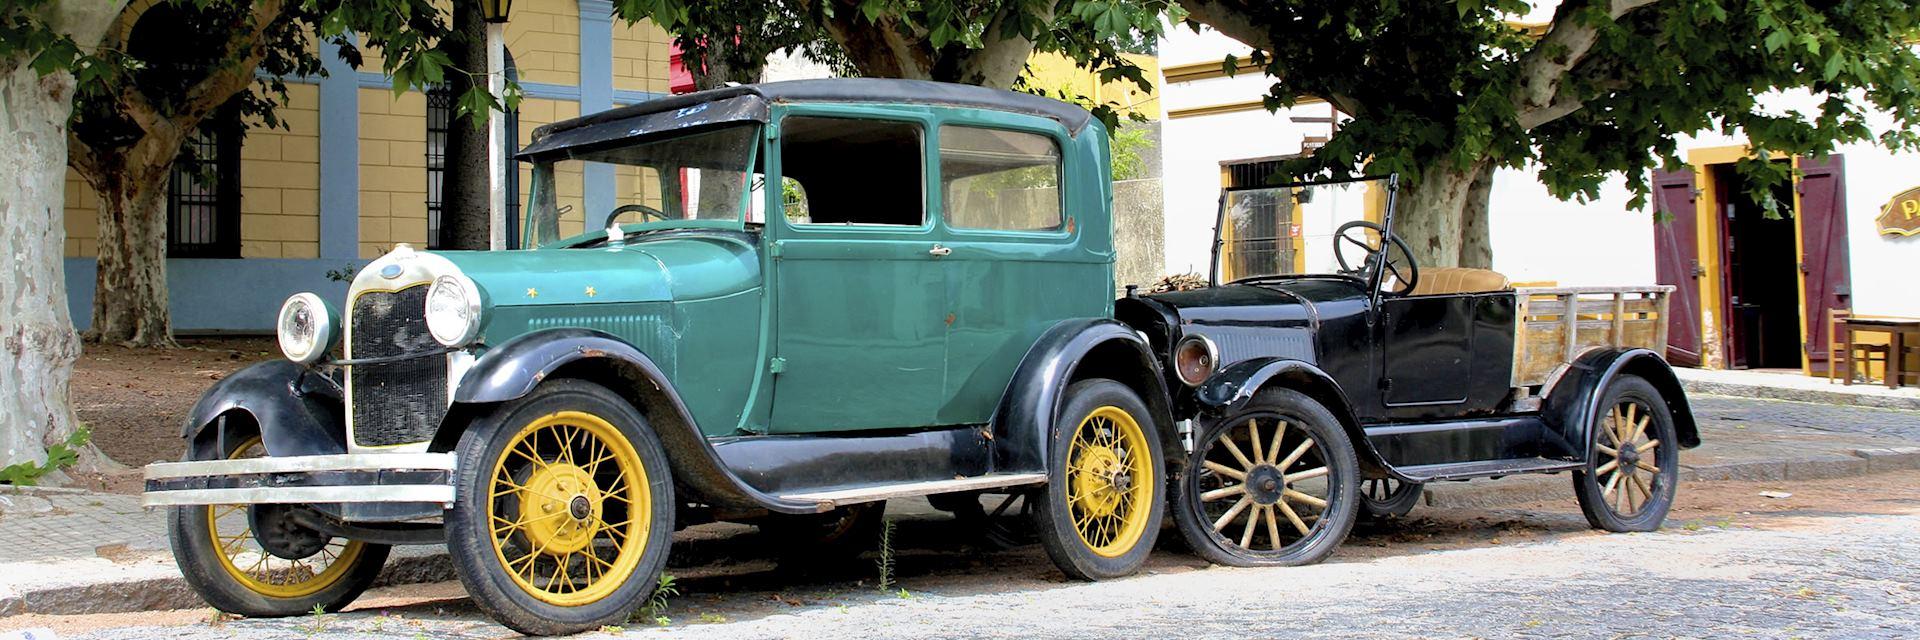 Vintage car in Montevideo